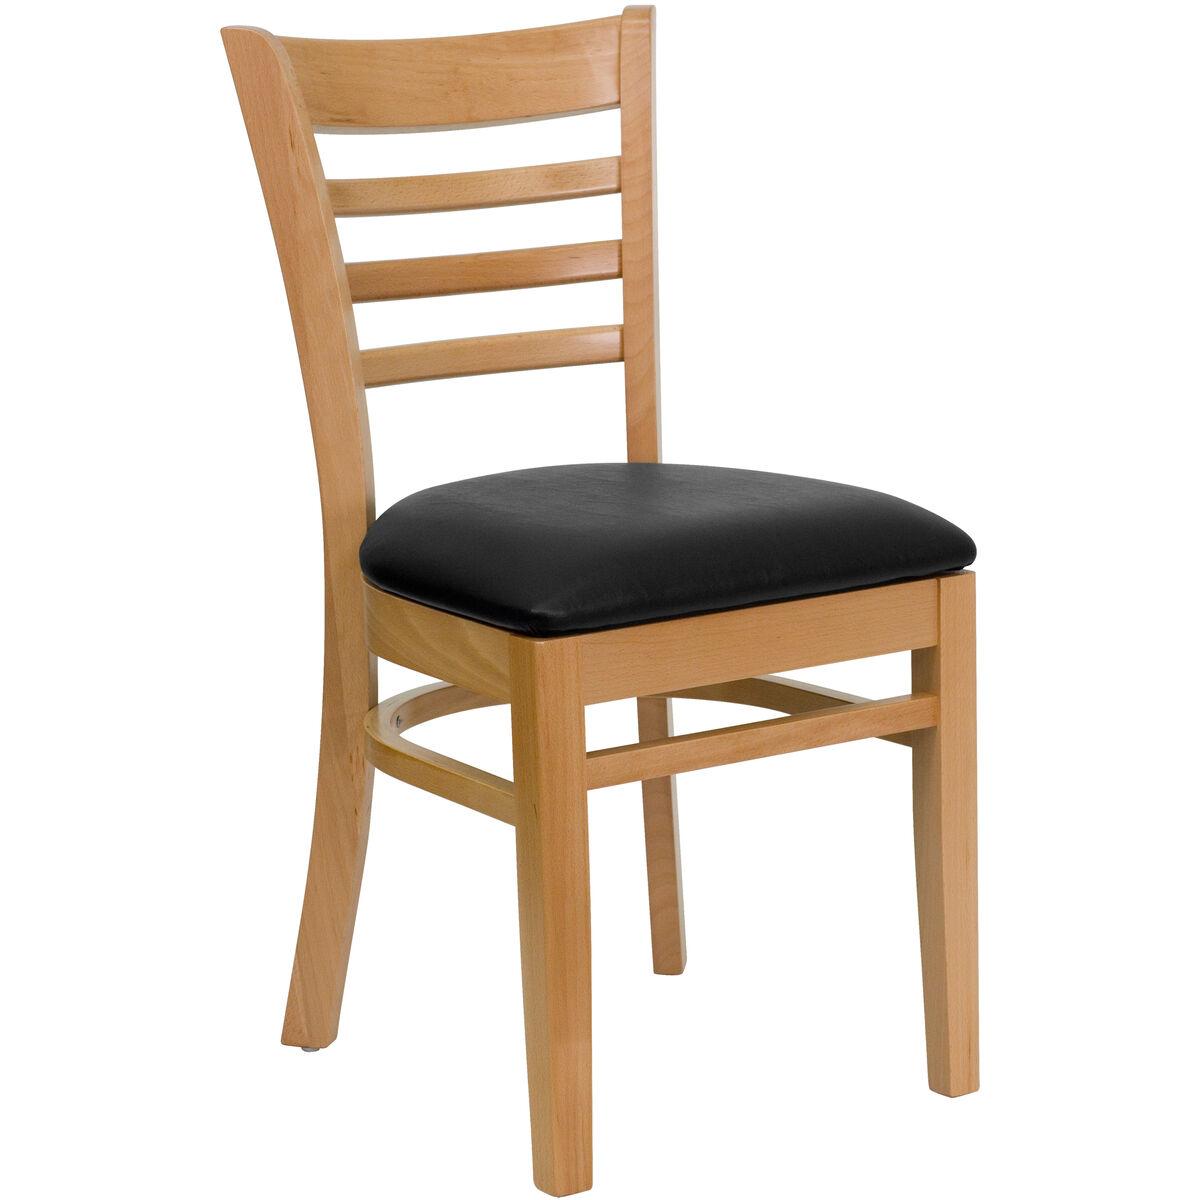 Restaurant Furniture 4 Less : T d restaurant equipment natural wood finished ladder